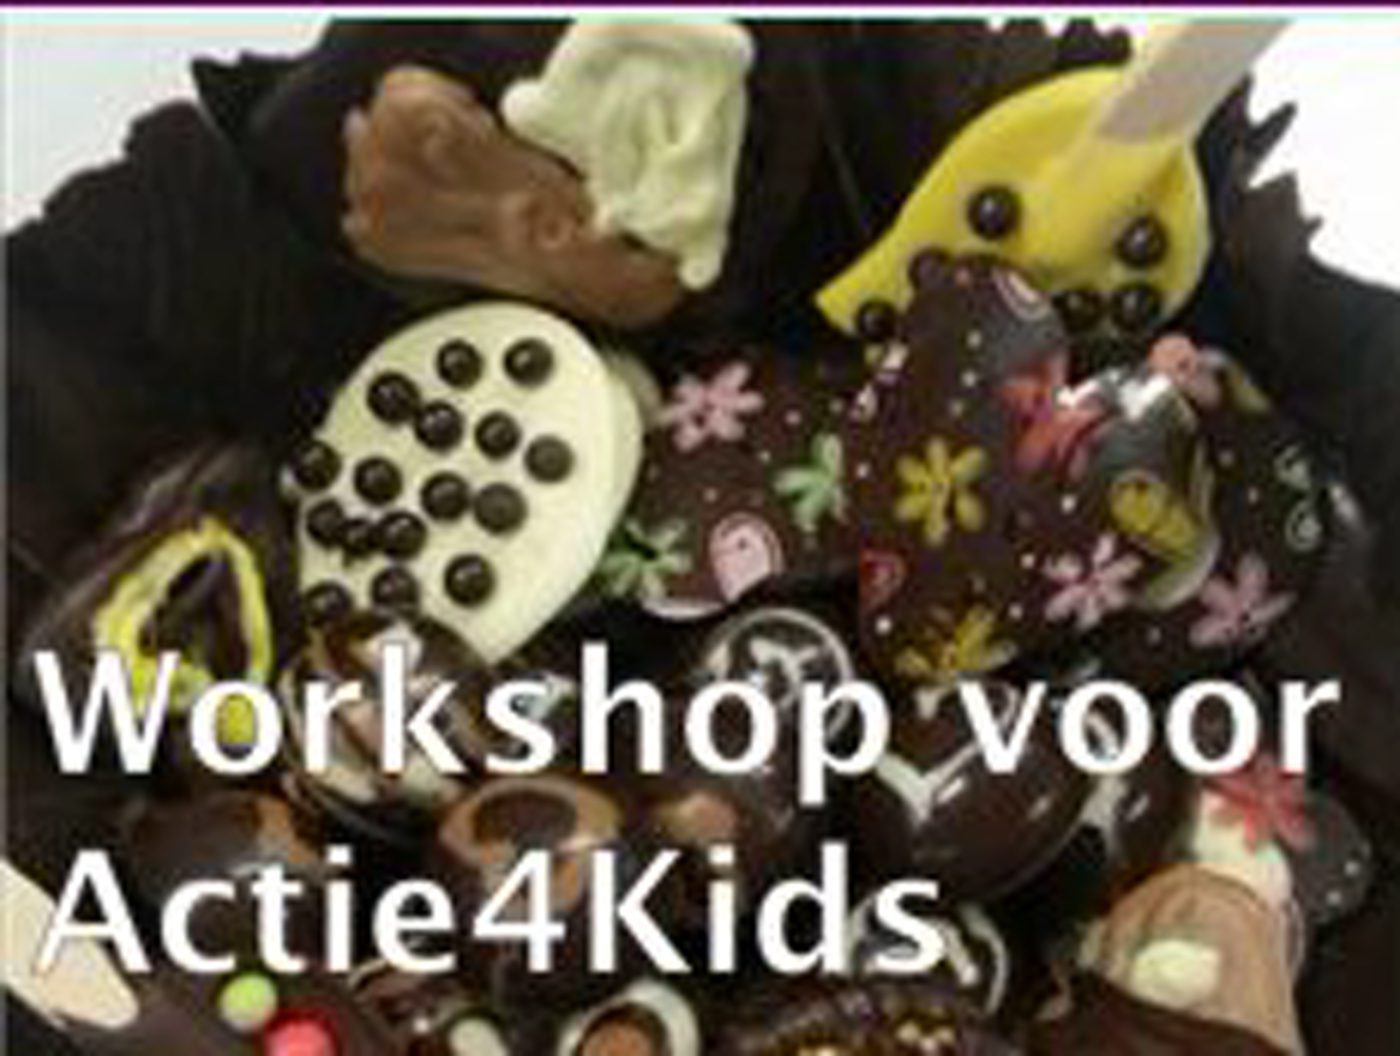 21 april – Actie4Kids workshop